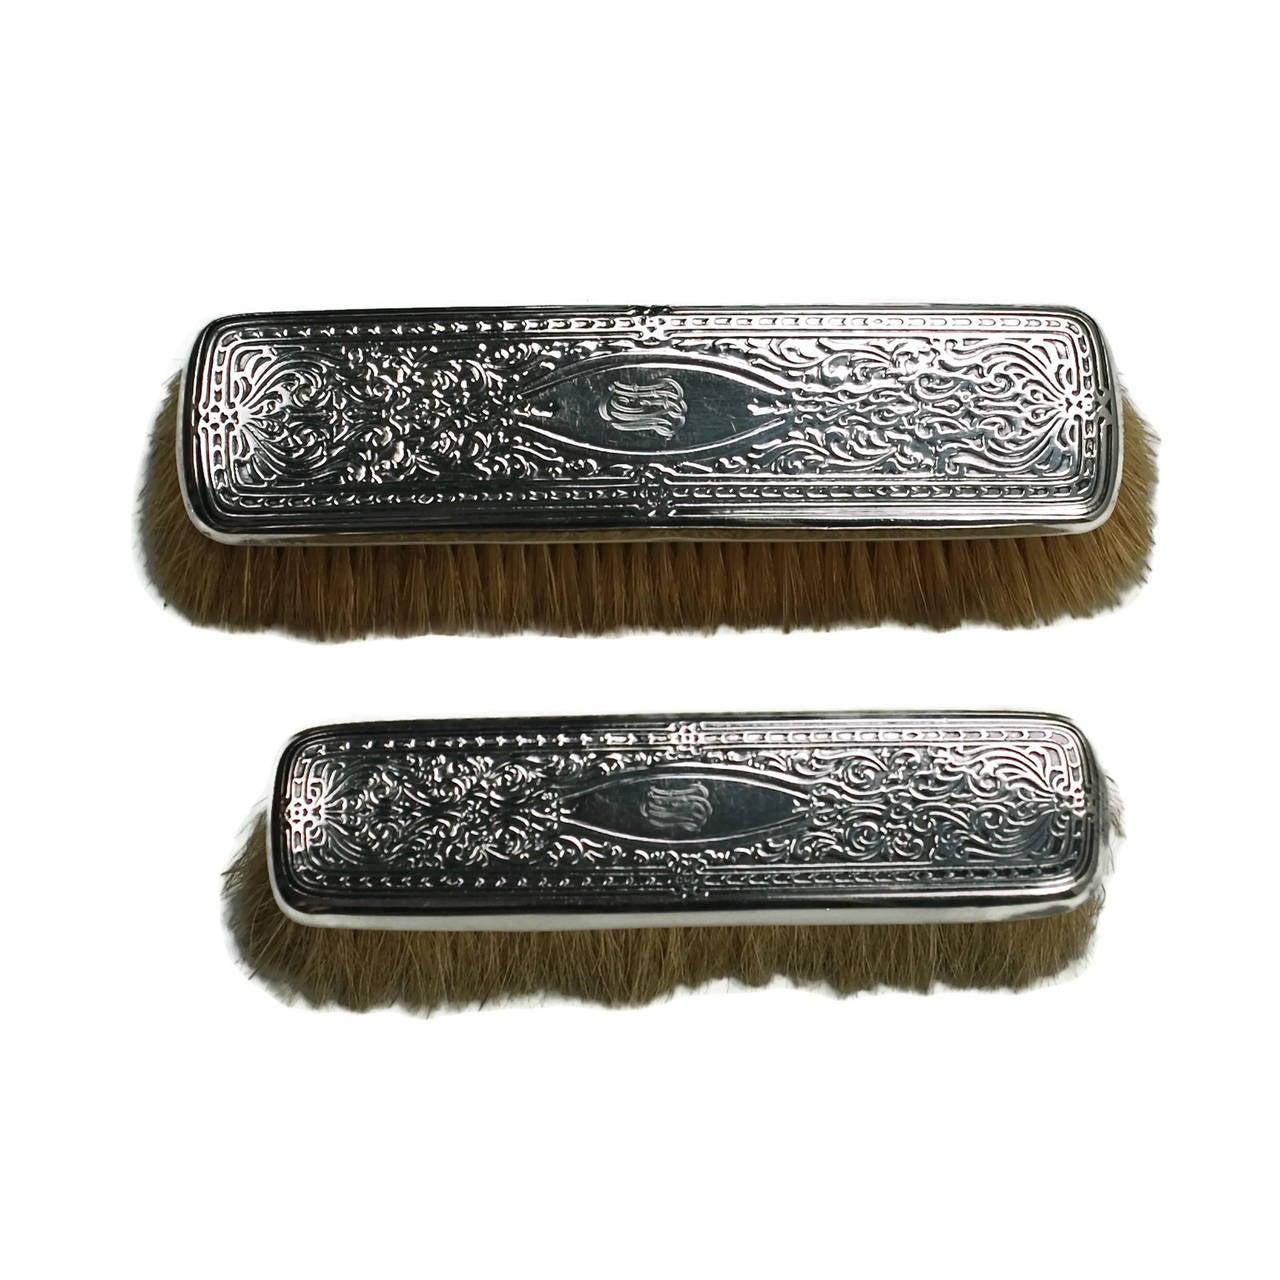 Edwardian Tiffany & Co. Sterling Silver 13-Piece Vanity Set For Sale 3